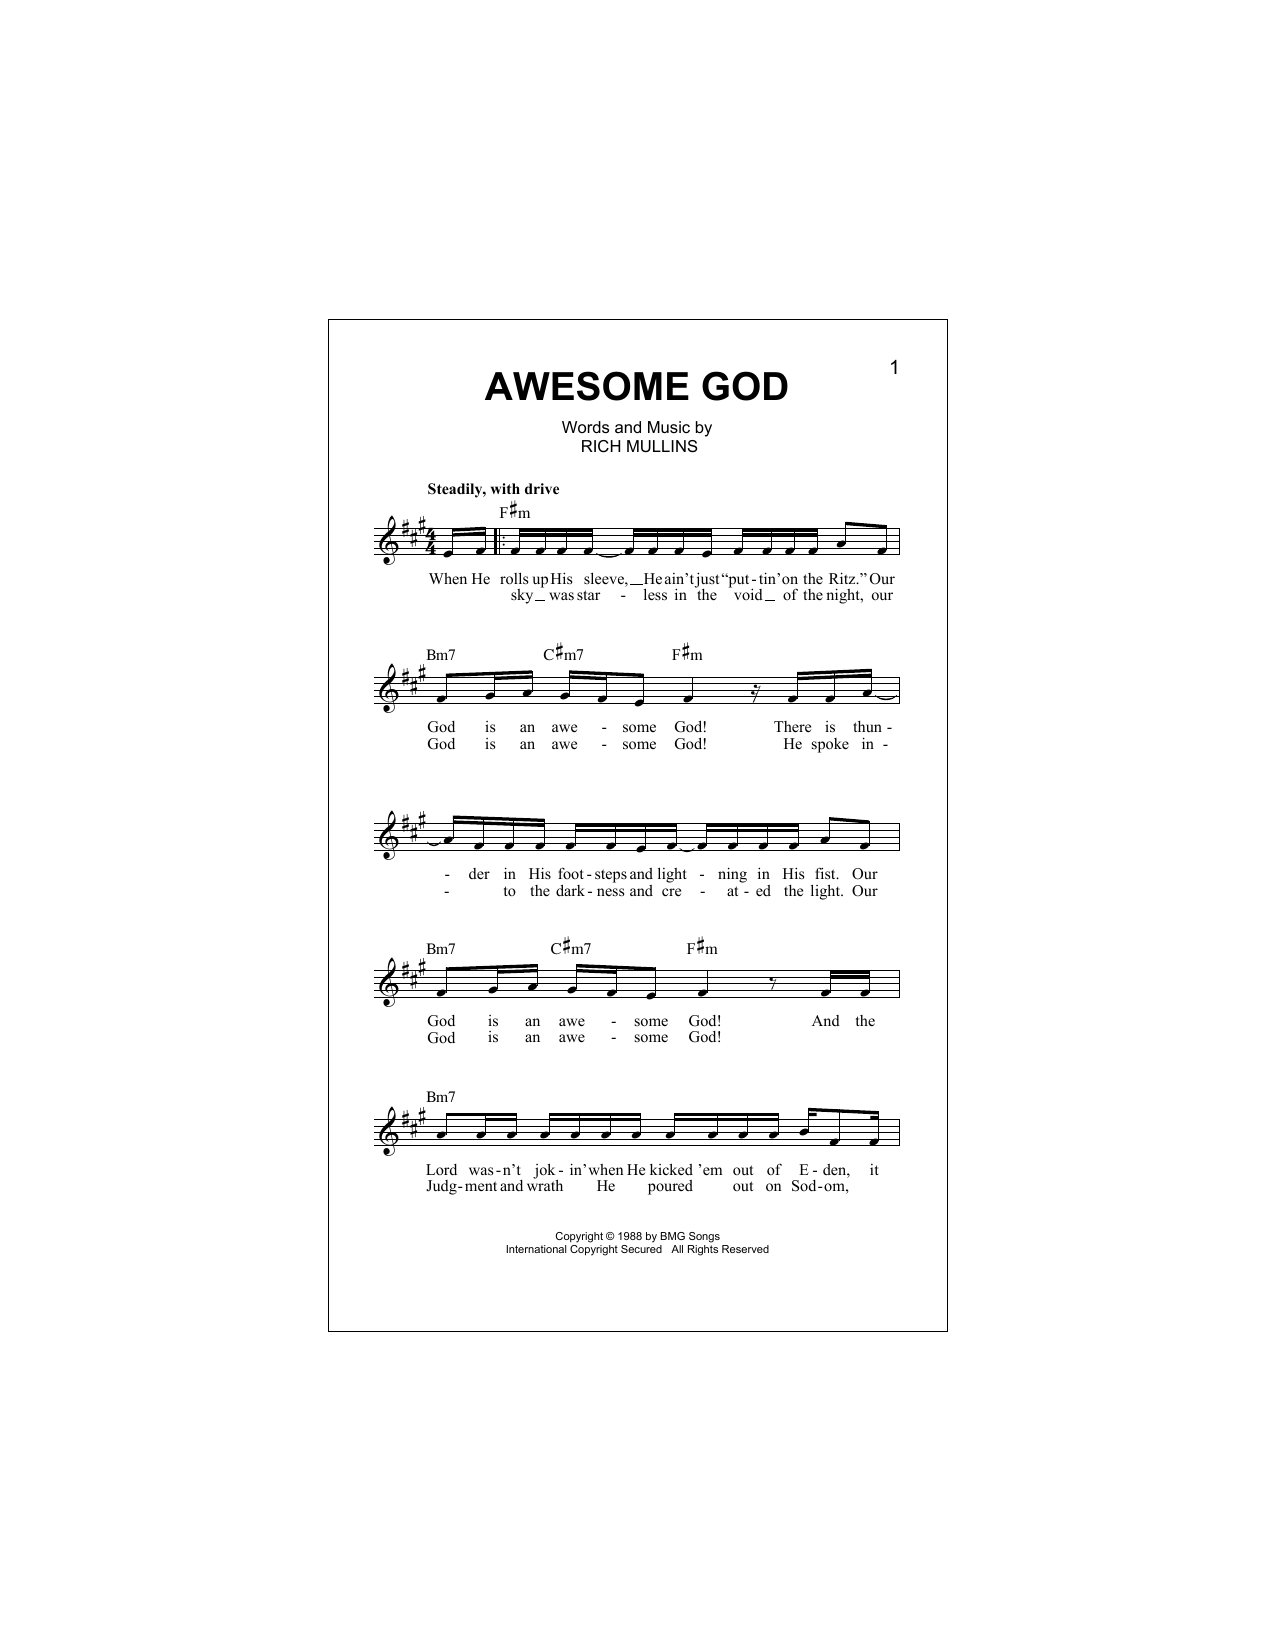 Awesome God Chords By Rich Mullins Melody Line Lyrics Chords